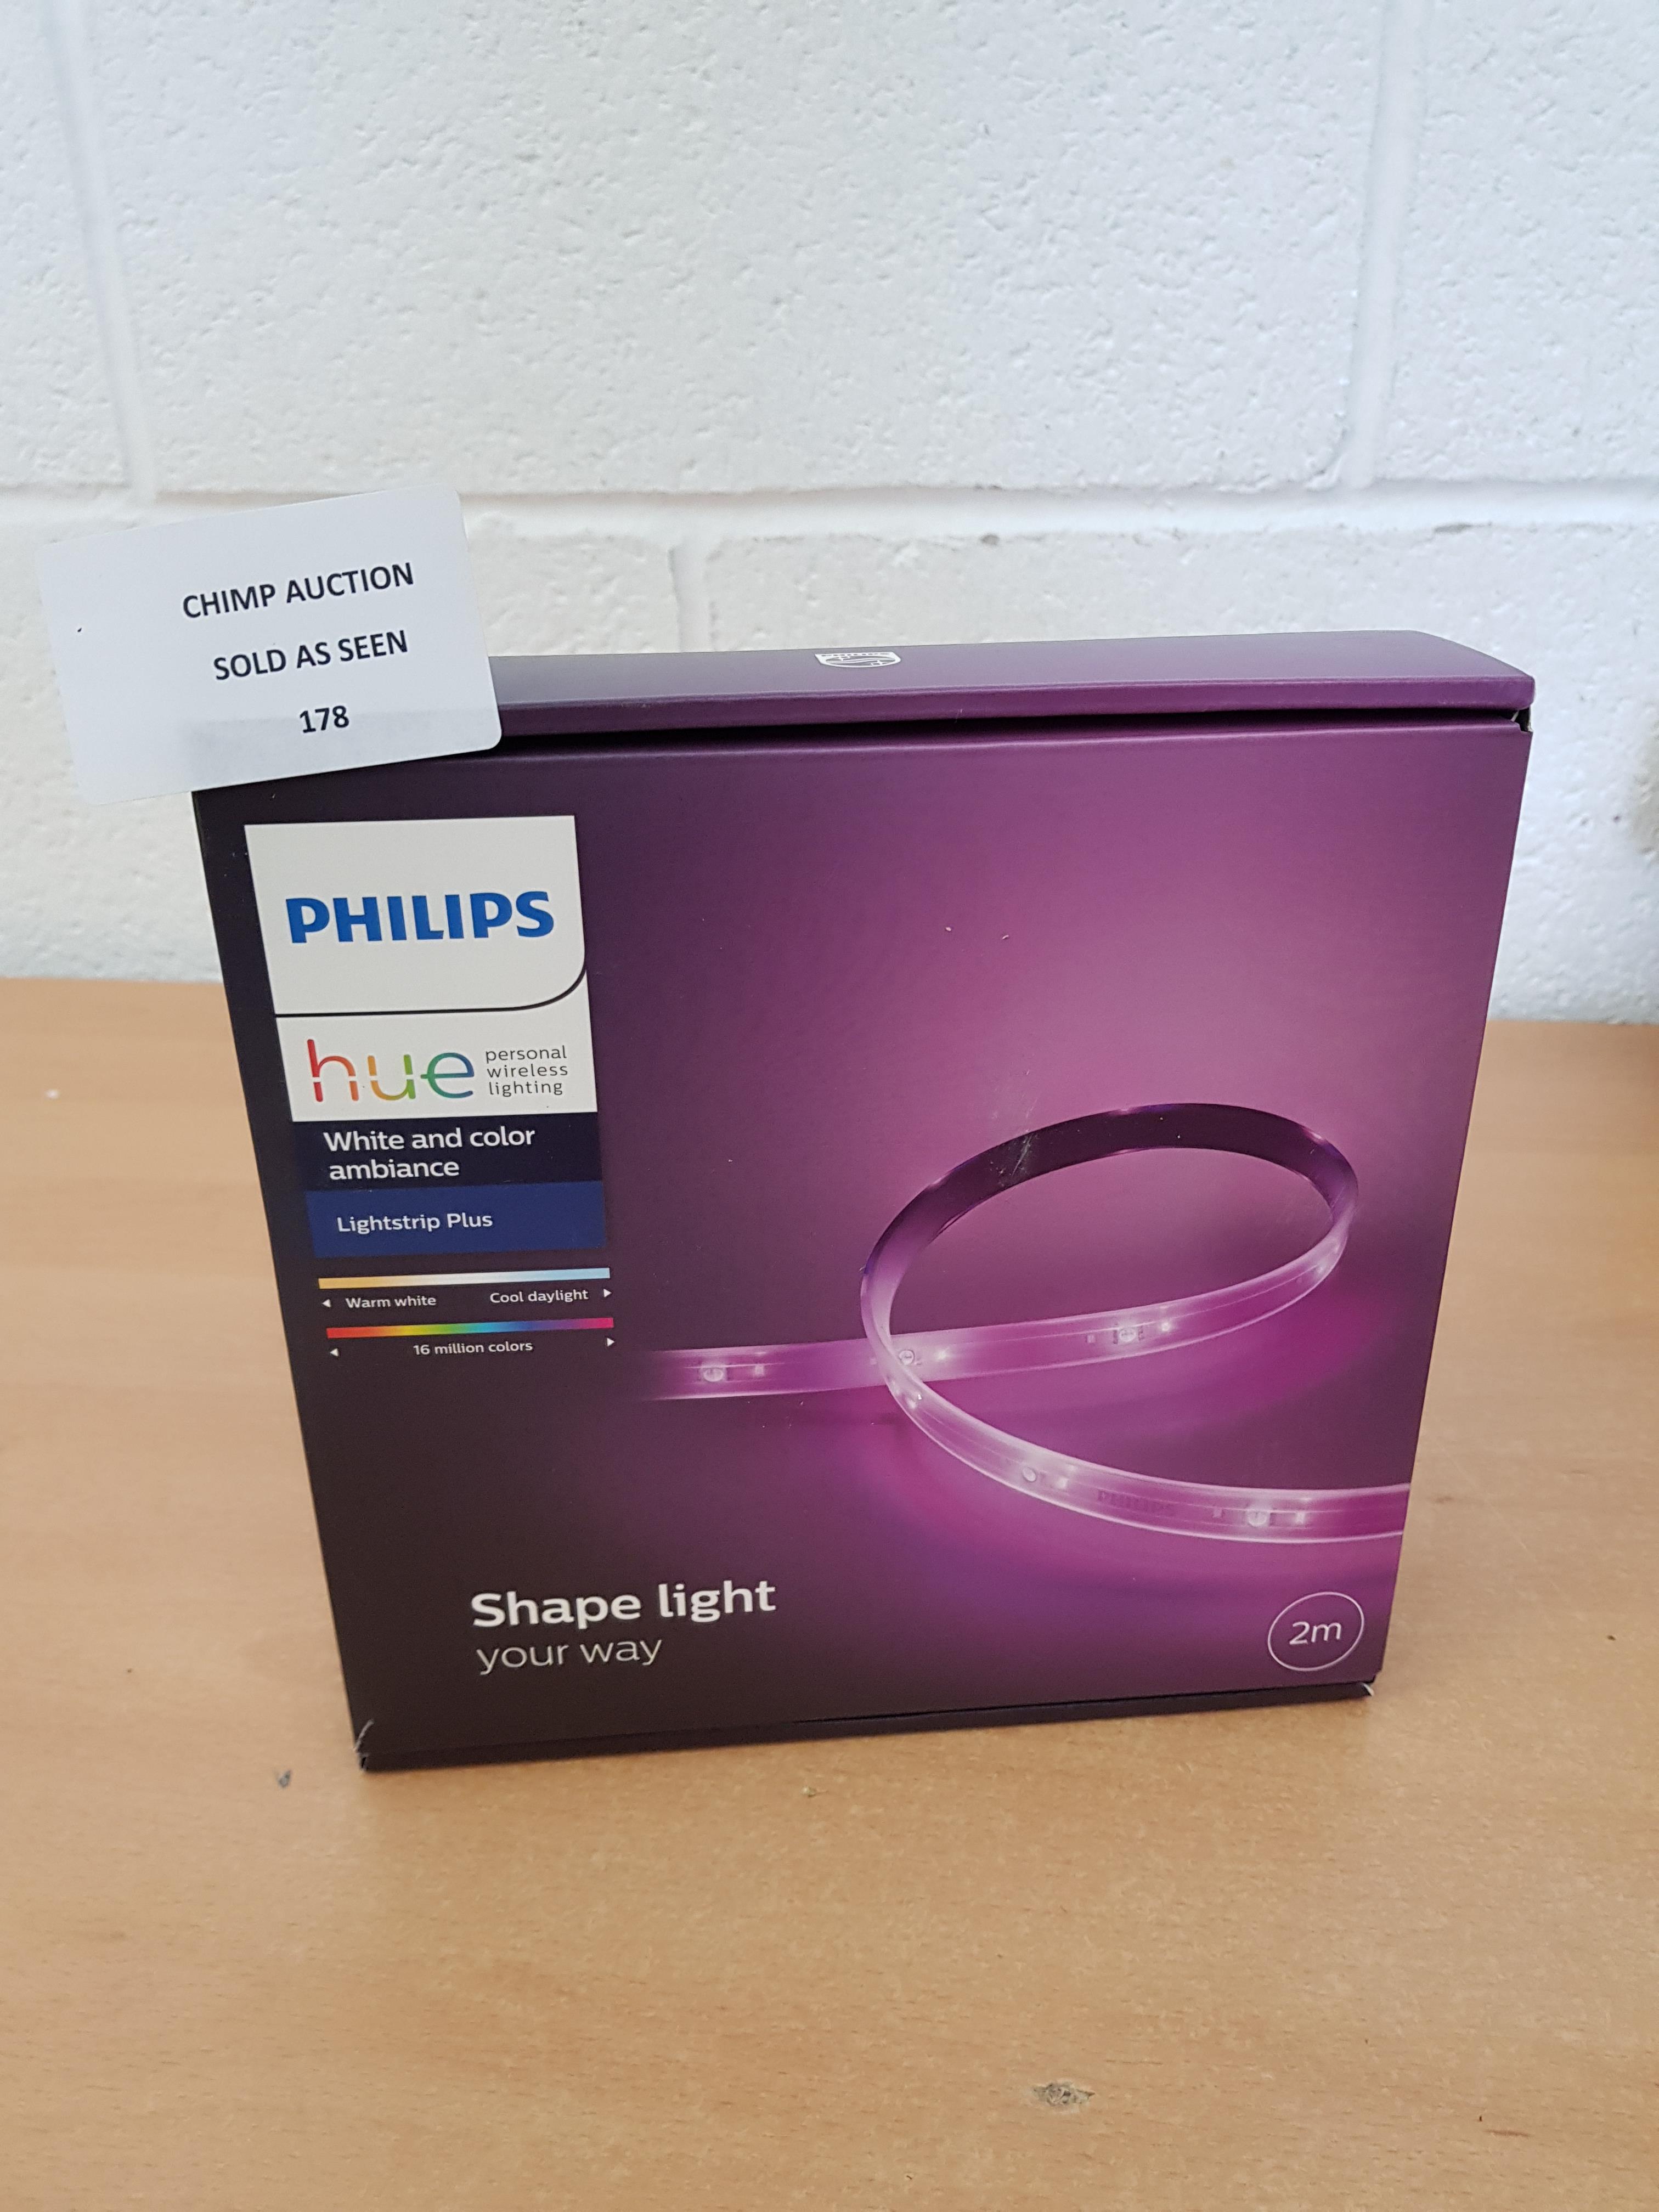 Lot 178 - Philips Hue LightStrip Plus 2 m Dimmable LED Smart Kit RRP £69.99.